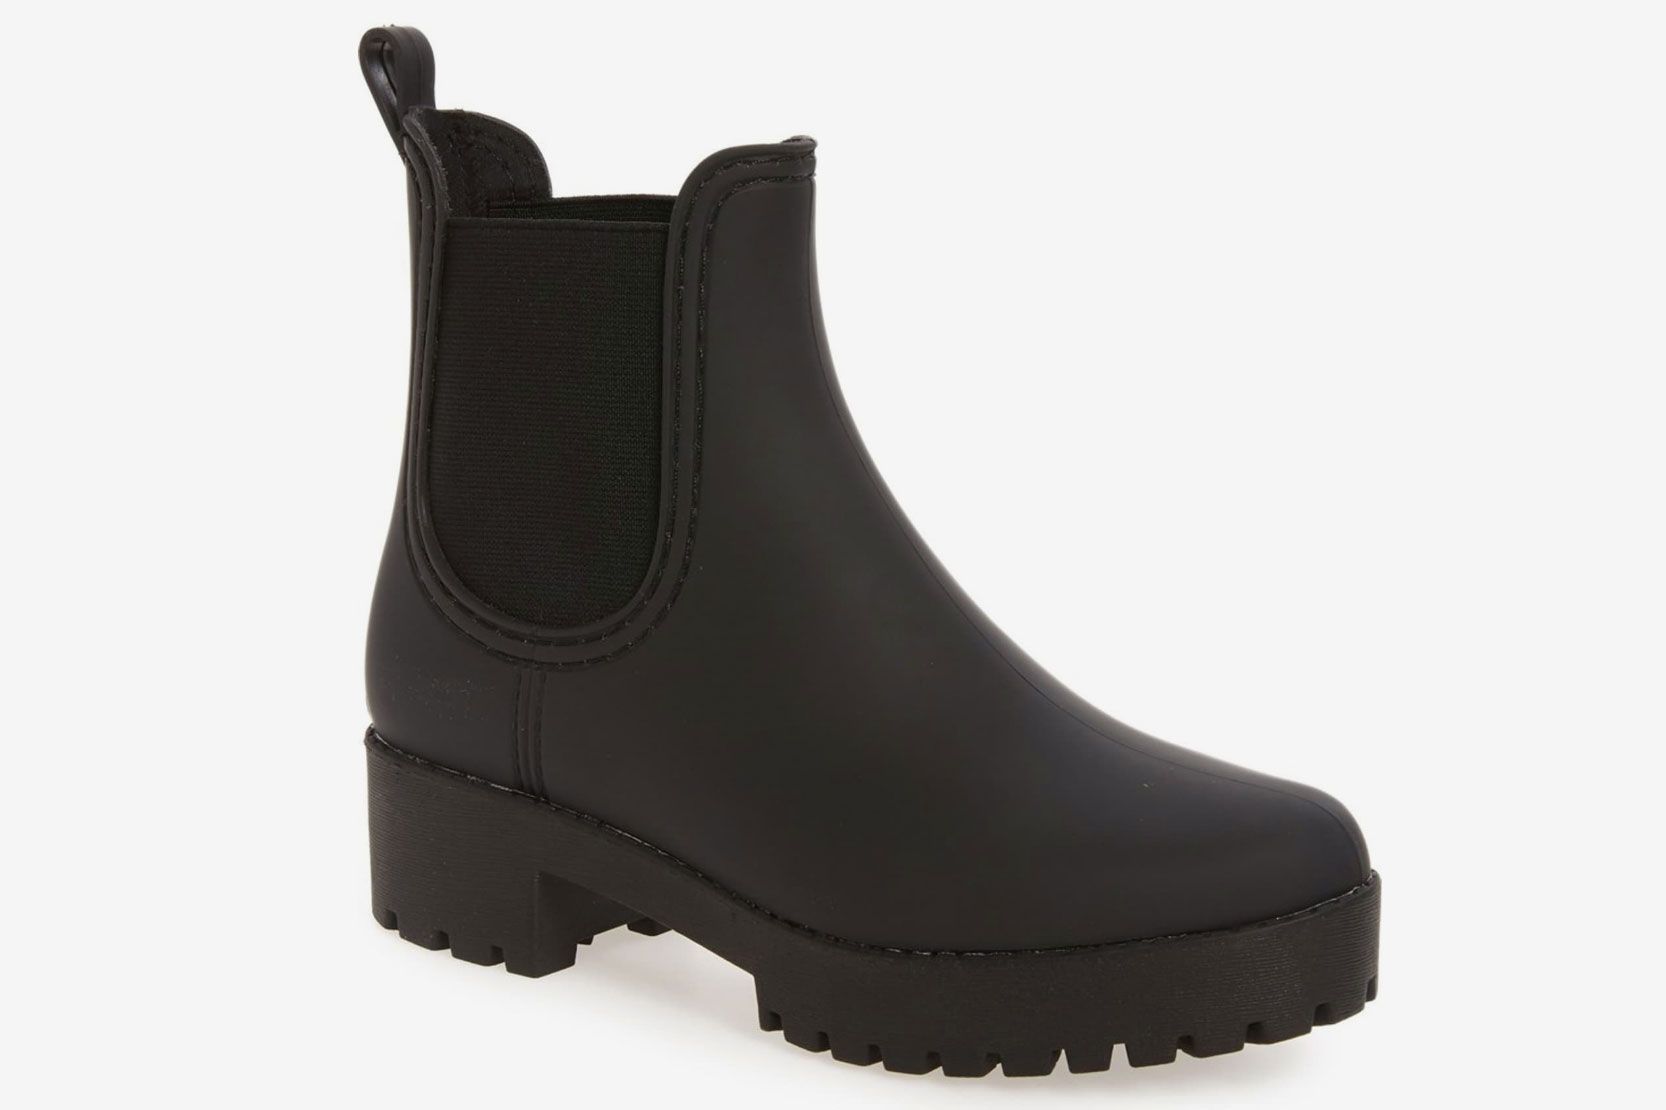 Jeffrey Campbell Cloudy Waterproof Chelsea Rain Boot